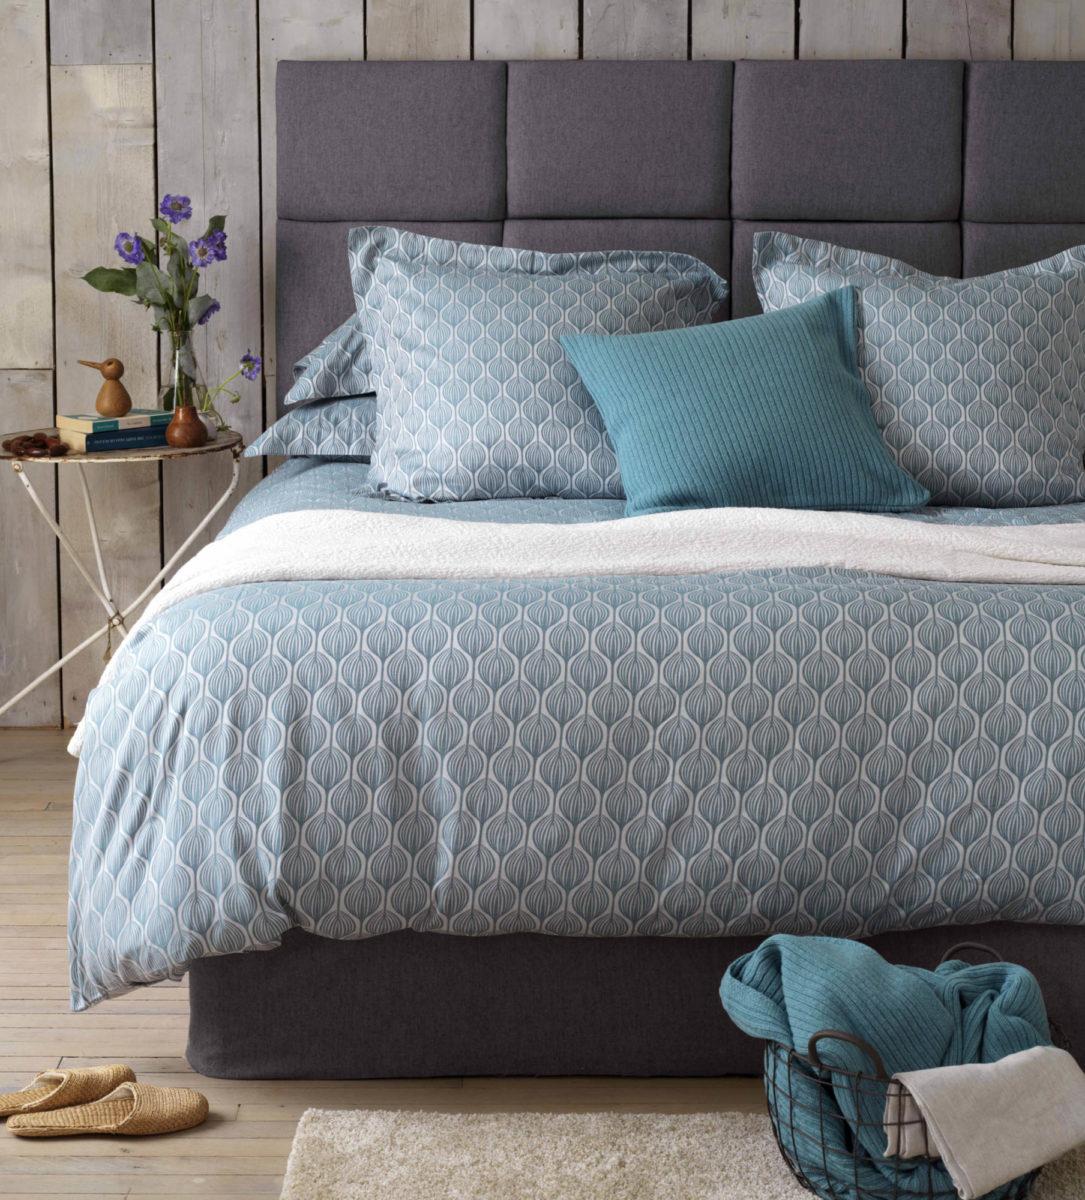 noah bed cover duvet product teal quilt linens range set bedding